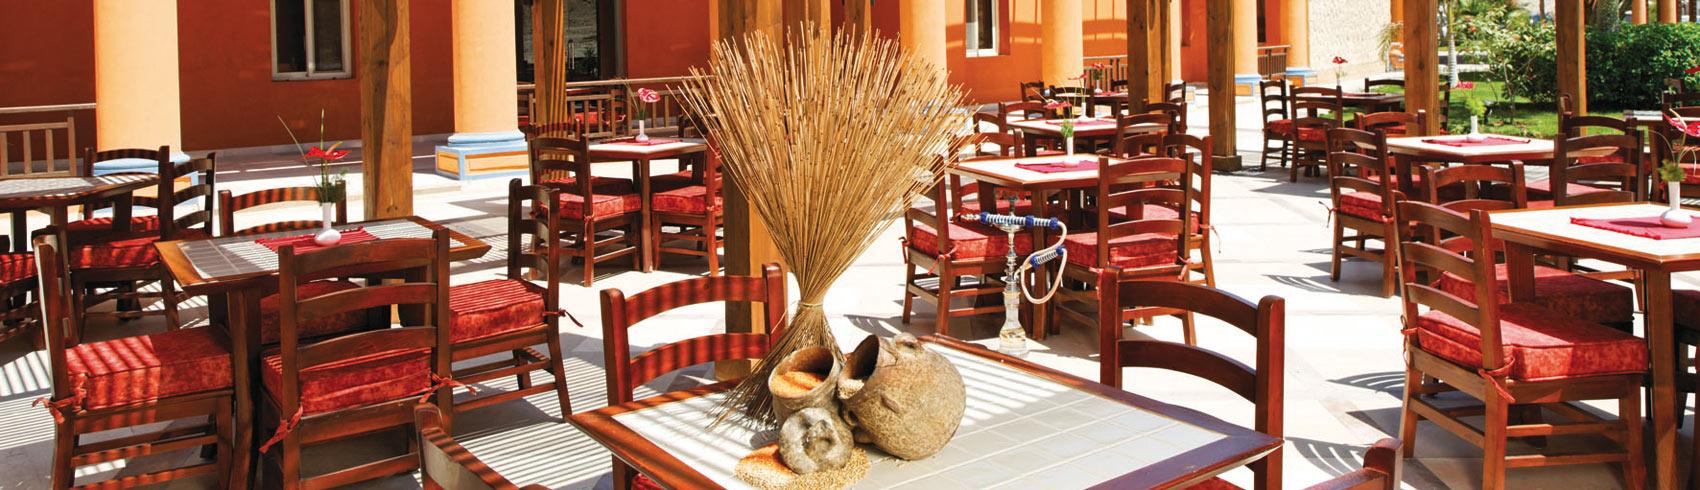 Mövenpick Resort El Sokhna image9